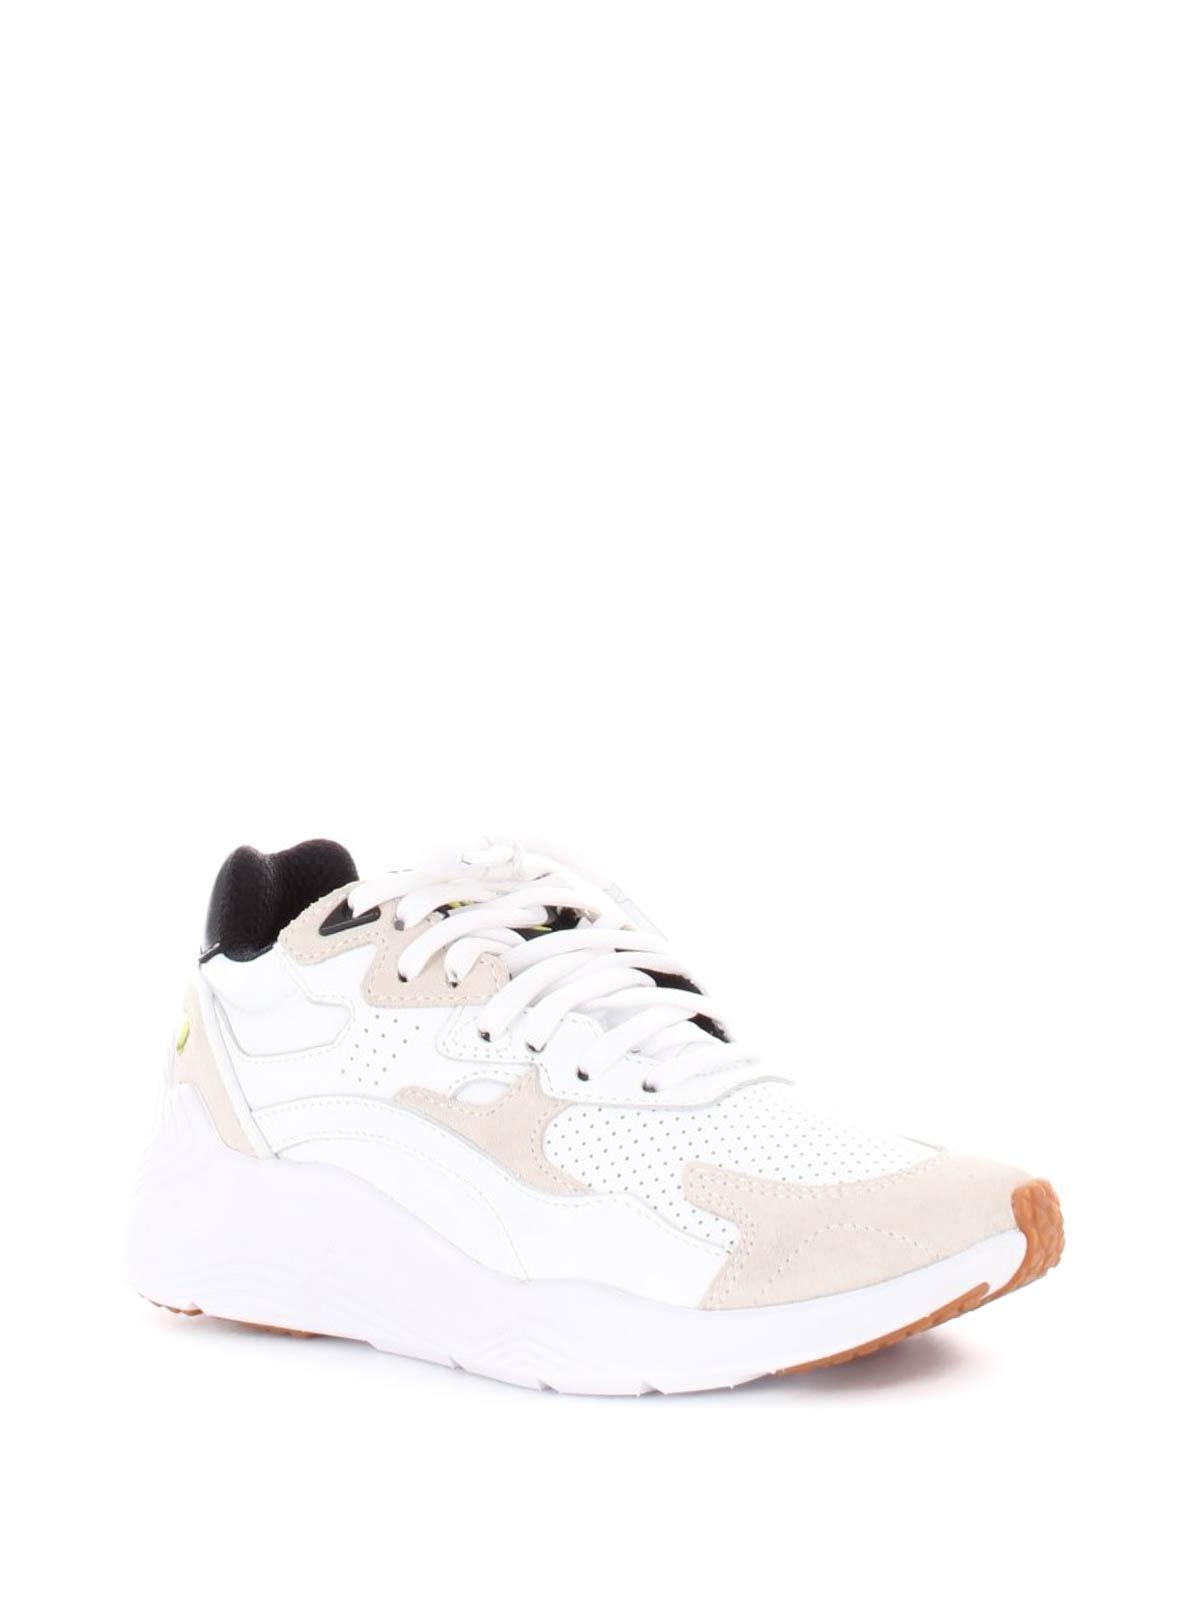 Mcq - Daku sneakers - trainers